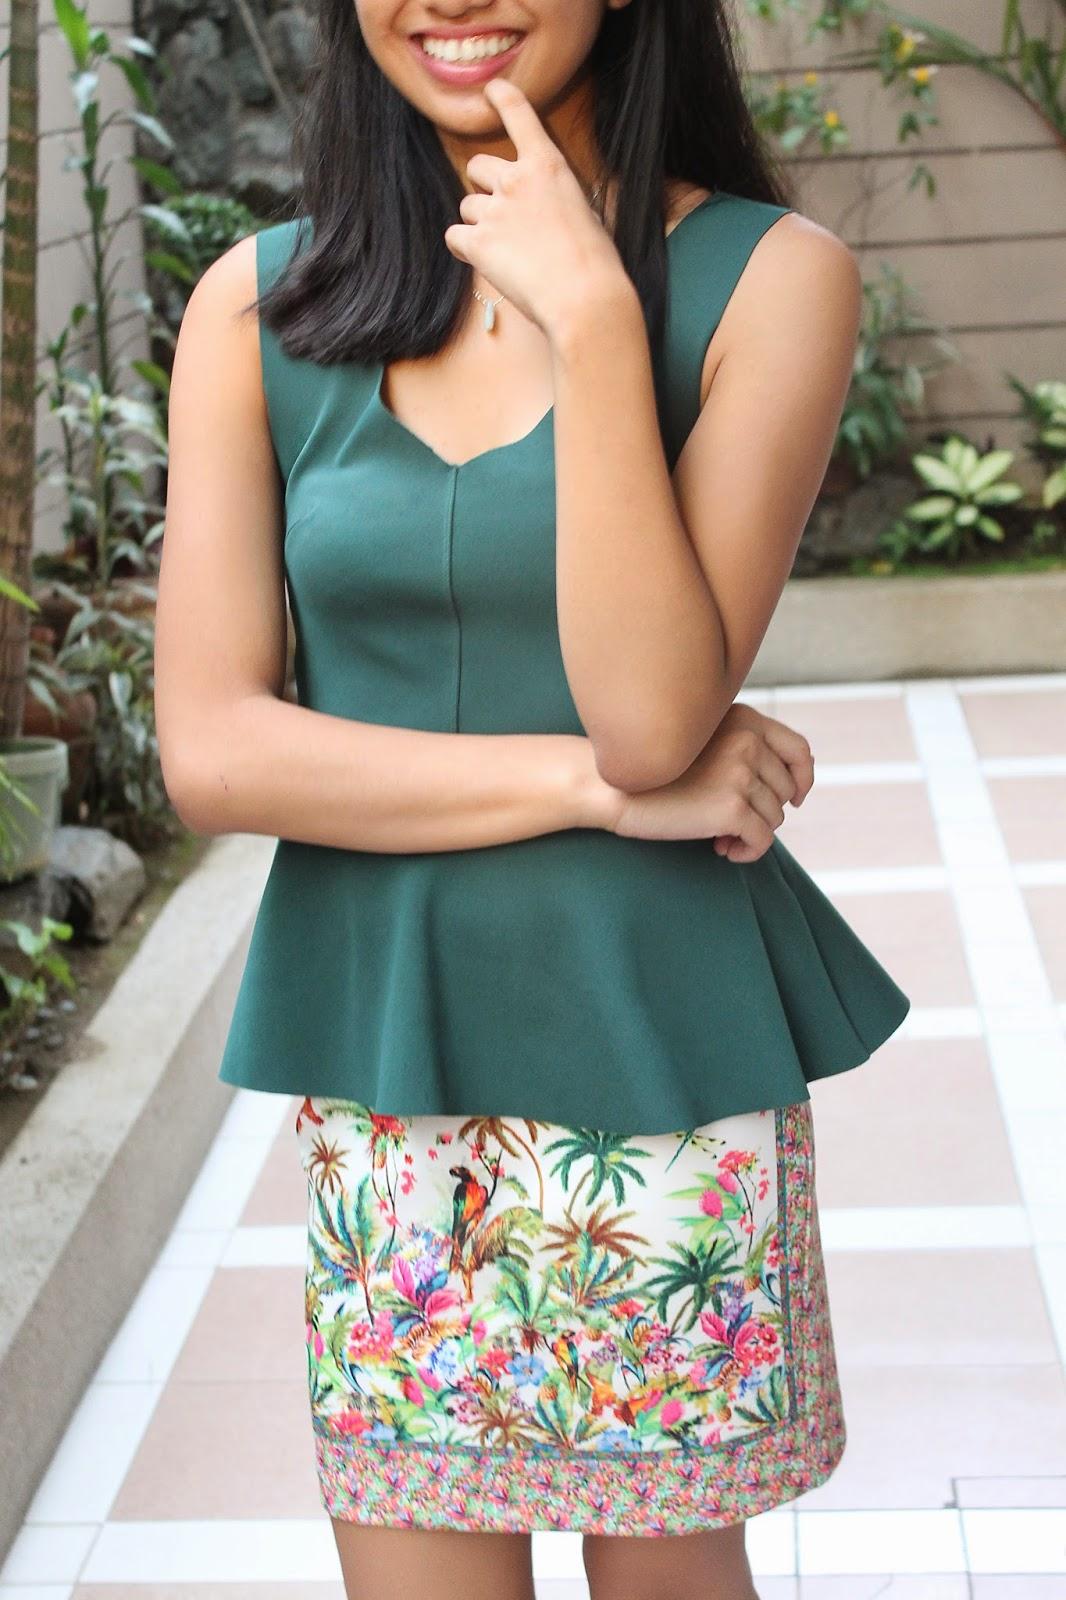 Fashion: Prima Donna (colors and bold pieces)